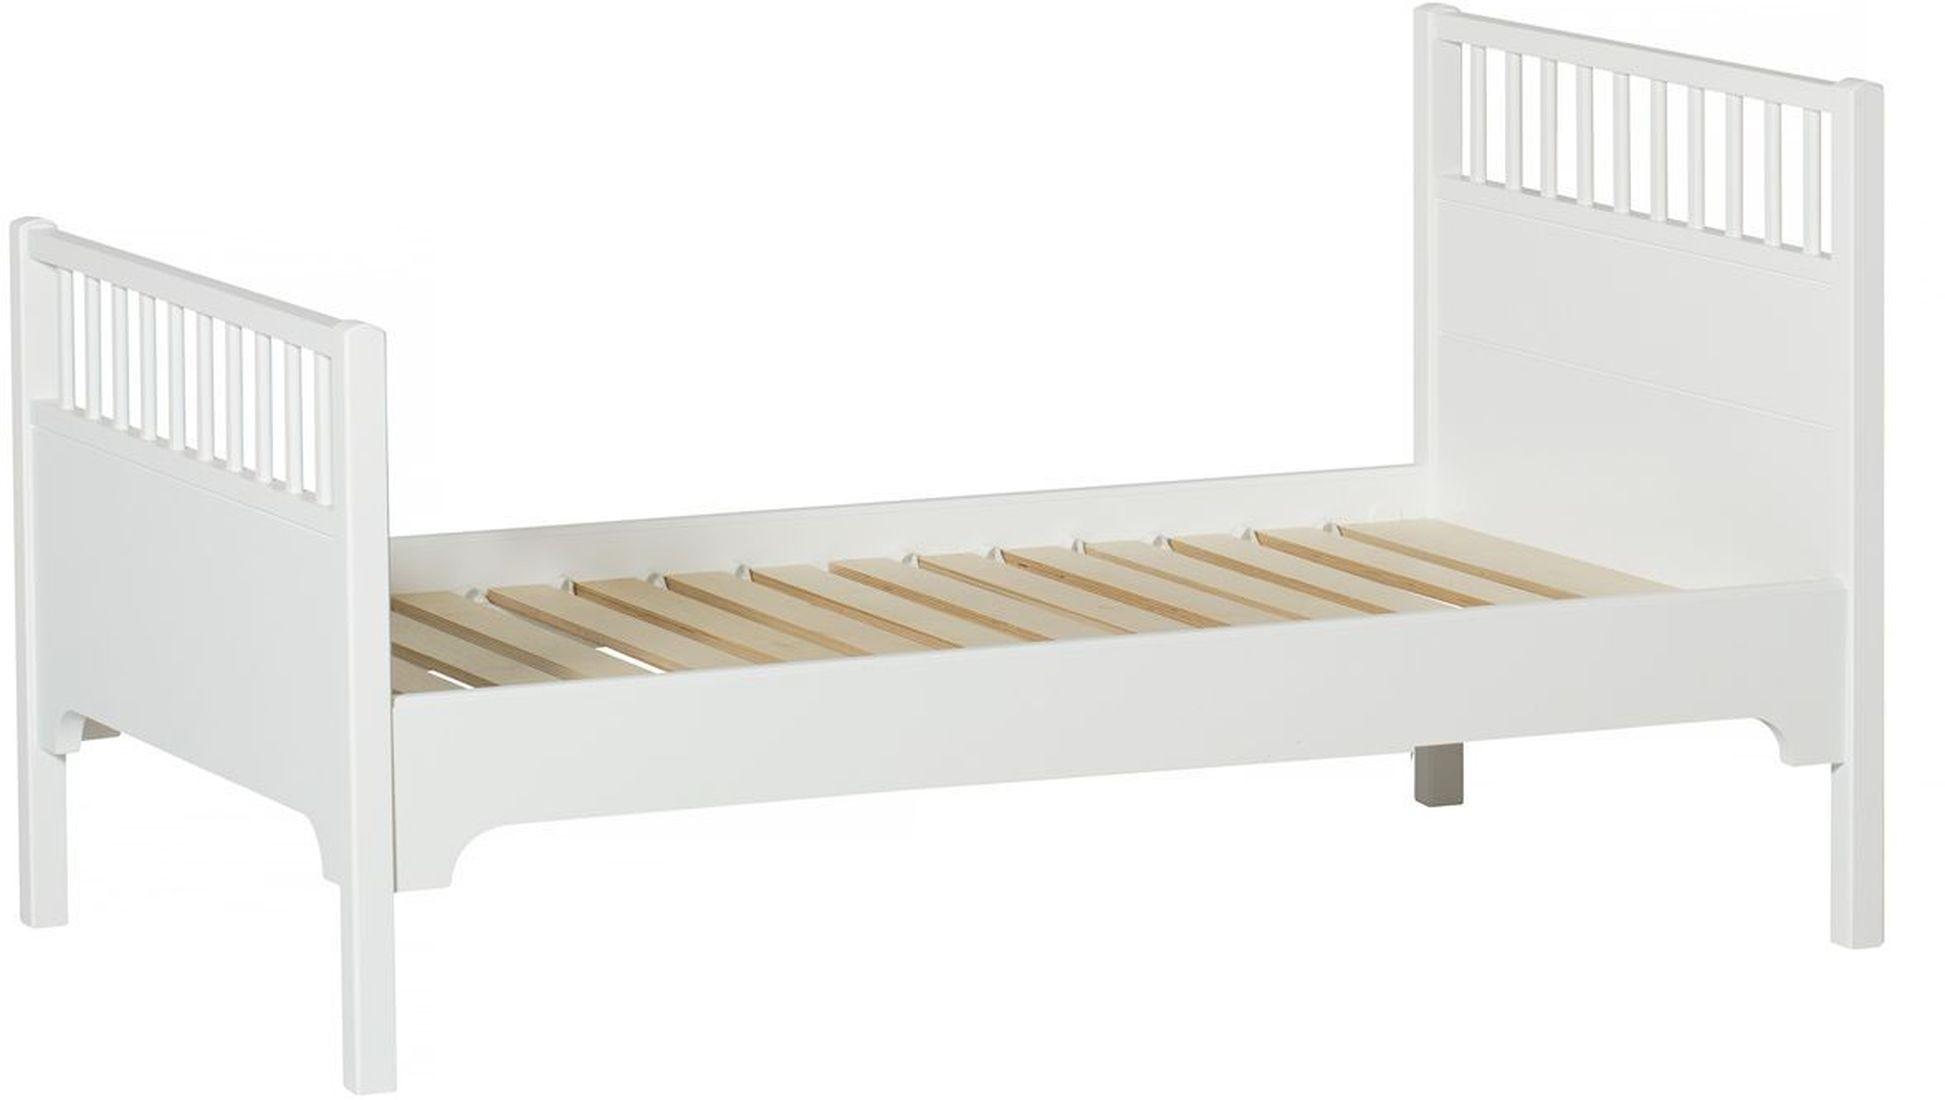 Juniorbett Kinderbett Seaside 90x160 Cm Oliver Furniture Kleine